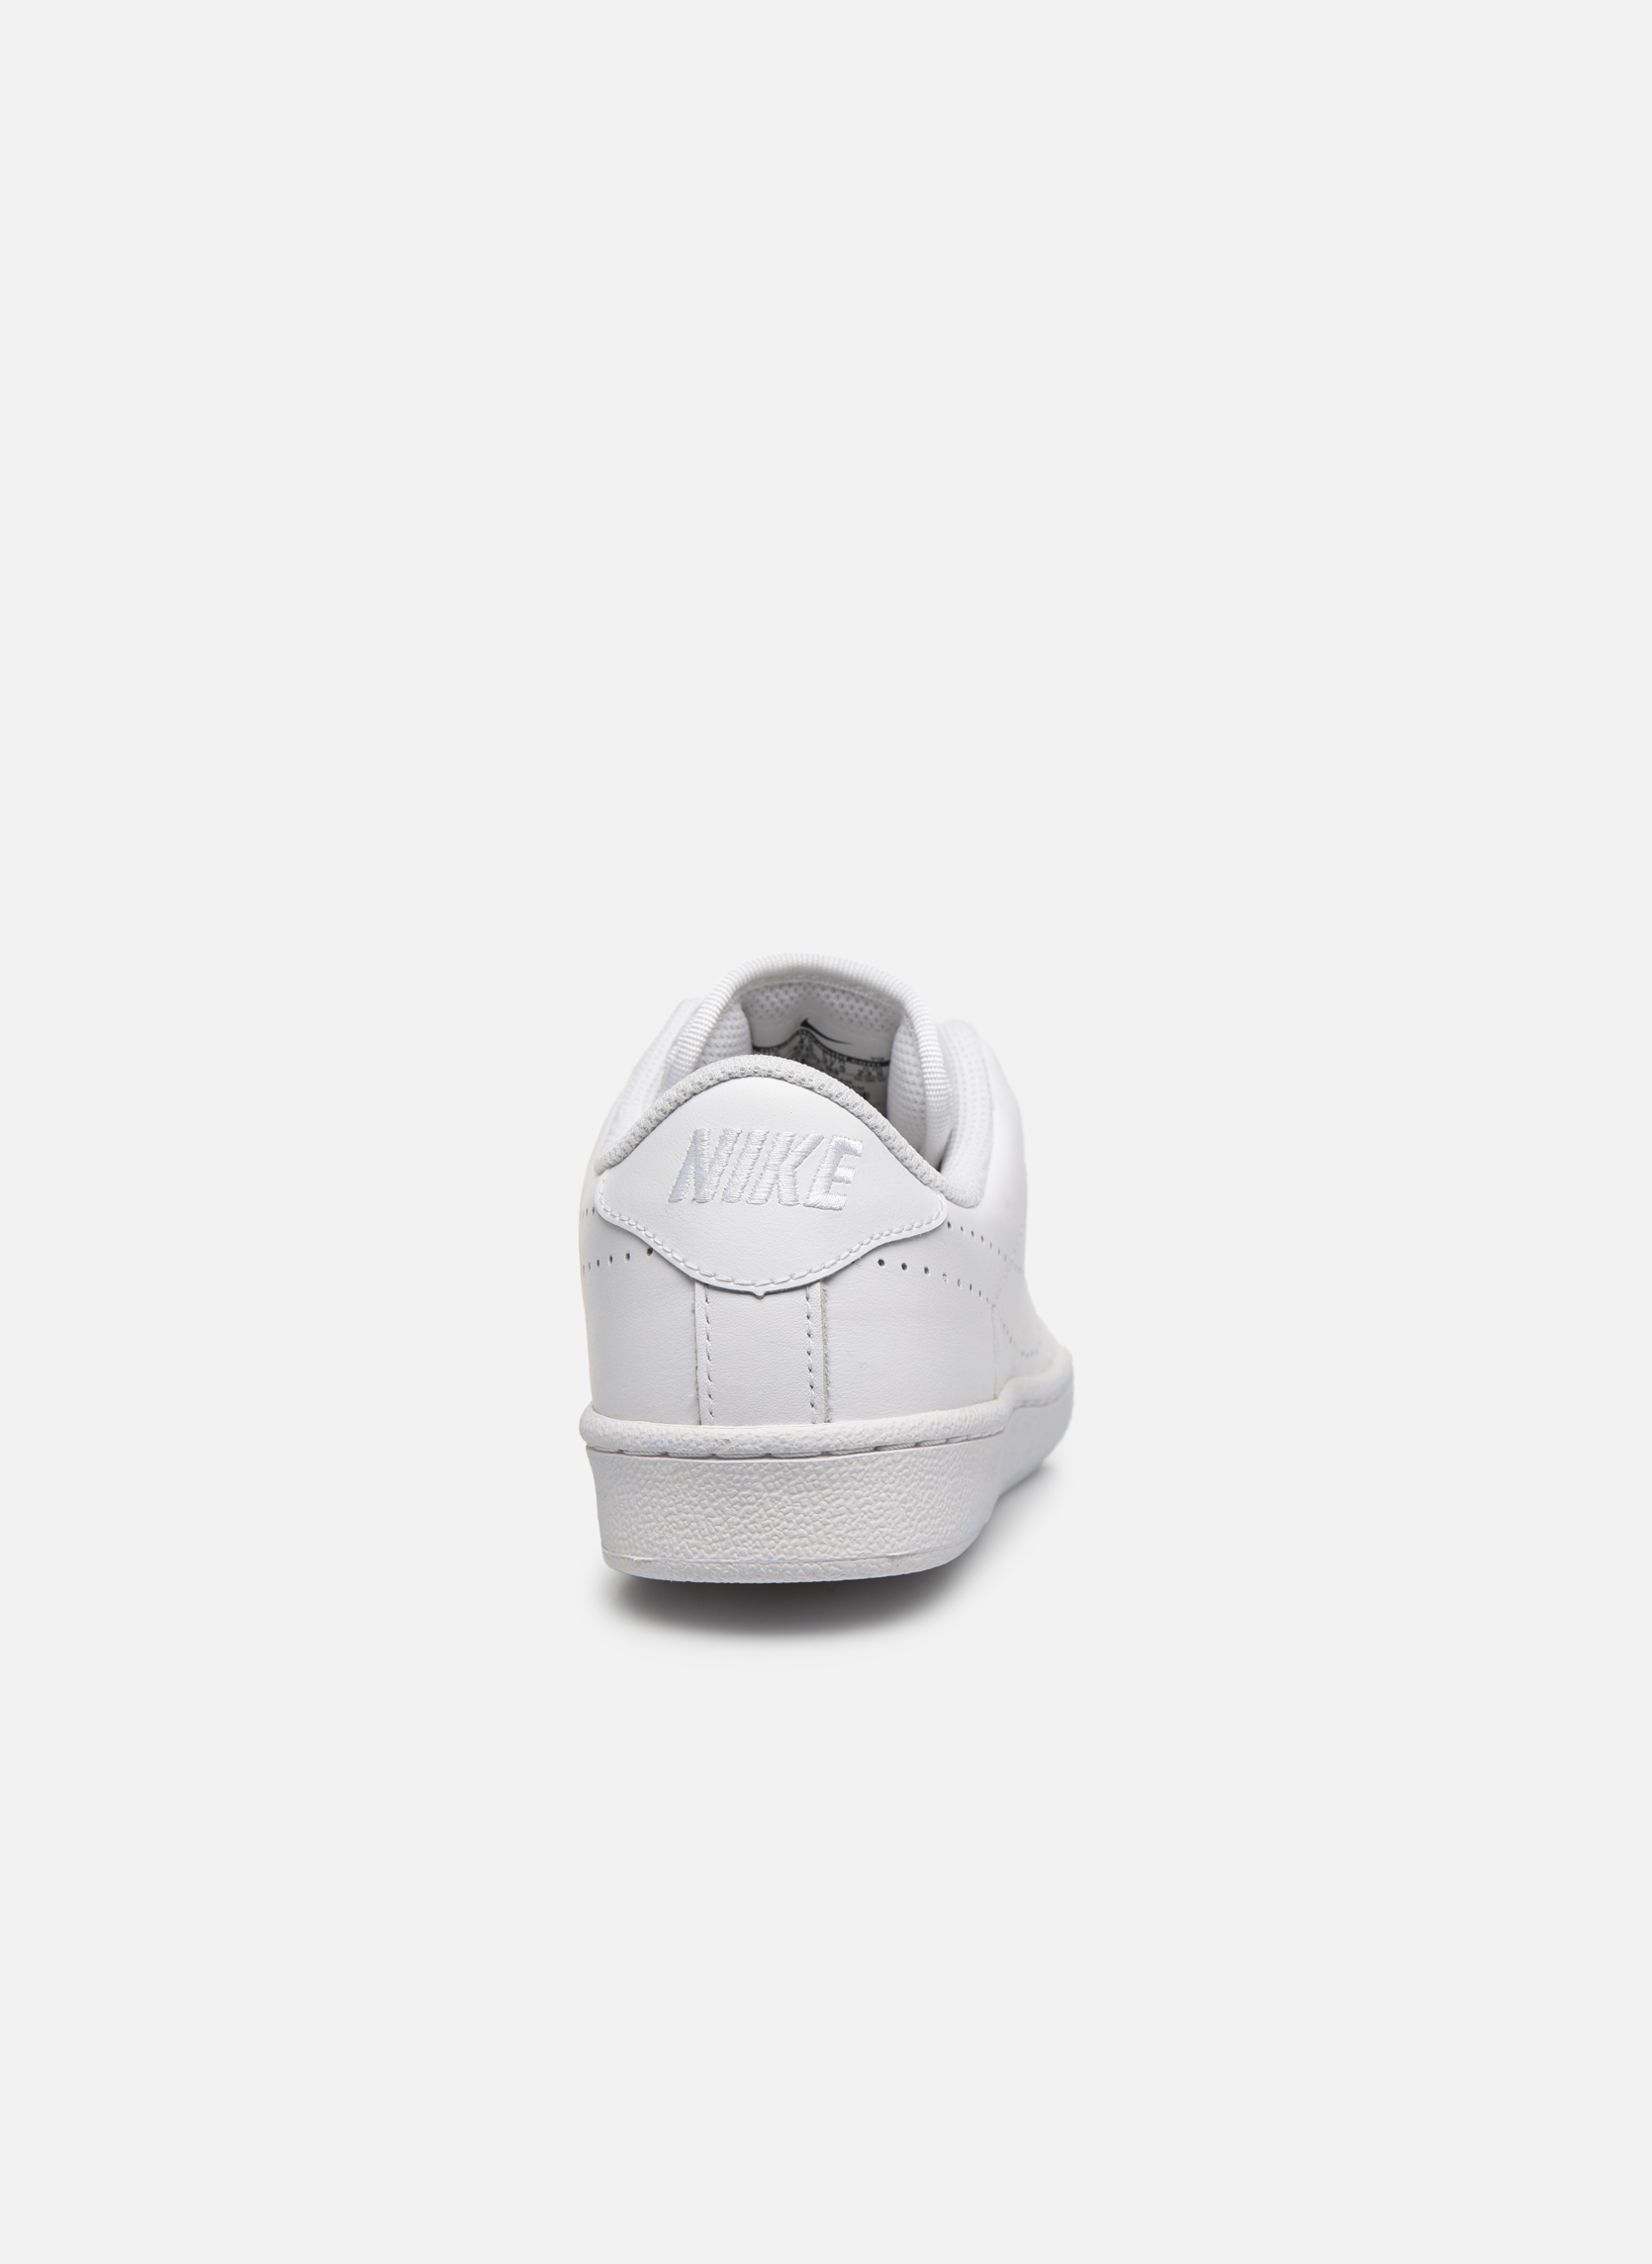 Nike Tennis Classic Prm (Gs) White White